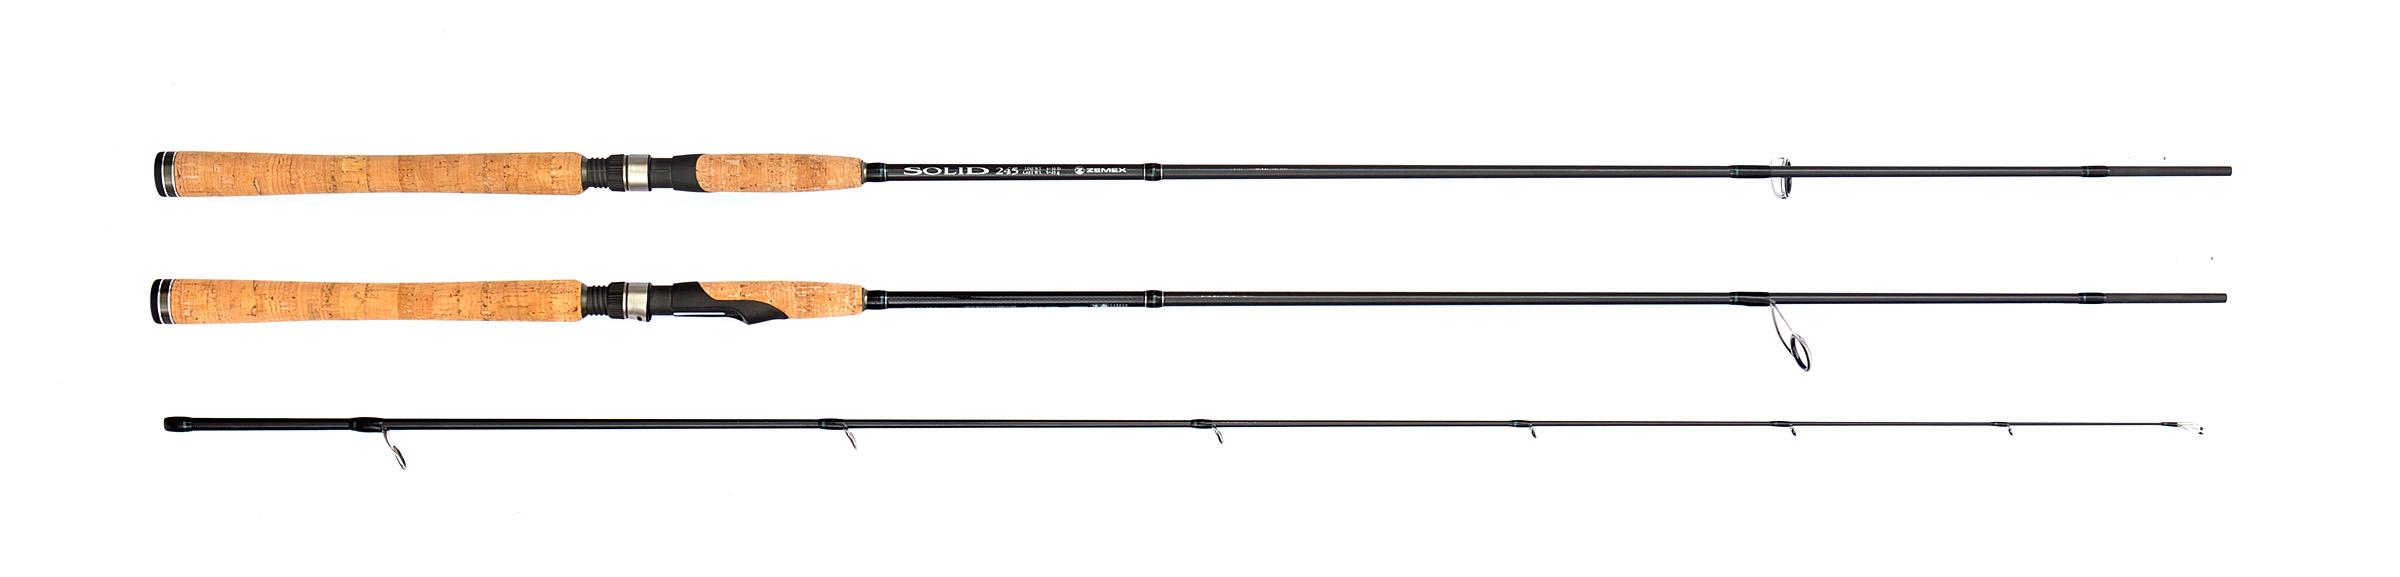 Спиннинг Zemex Solid 2,70м 10-42гр NEW